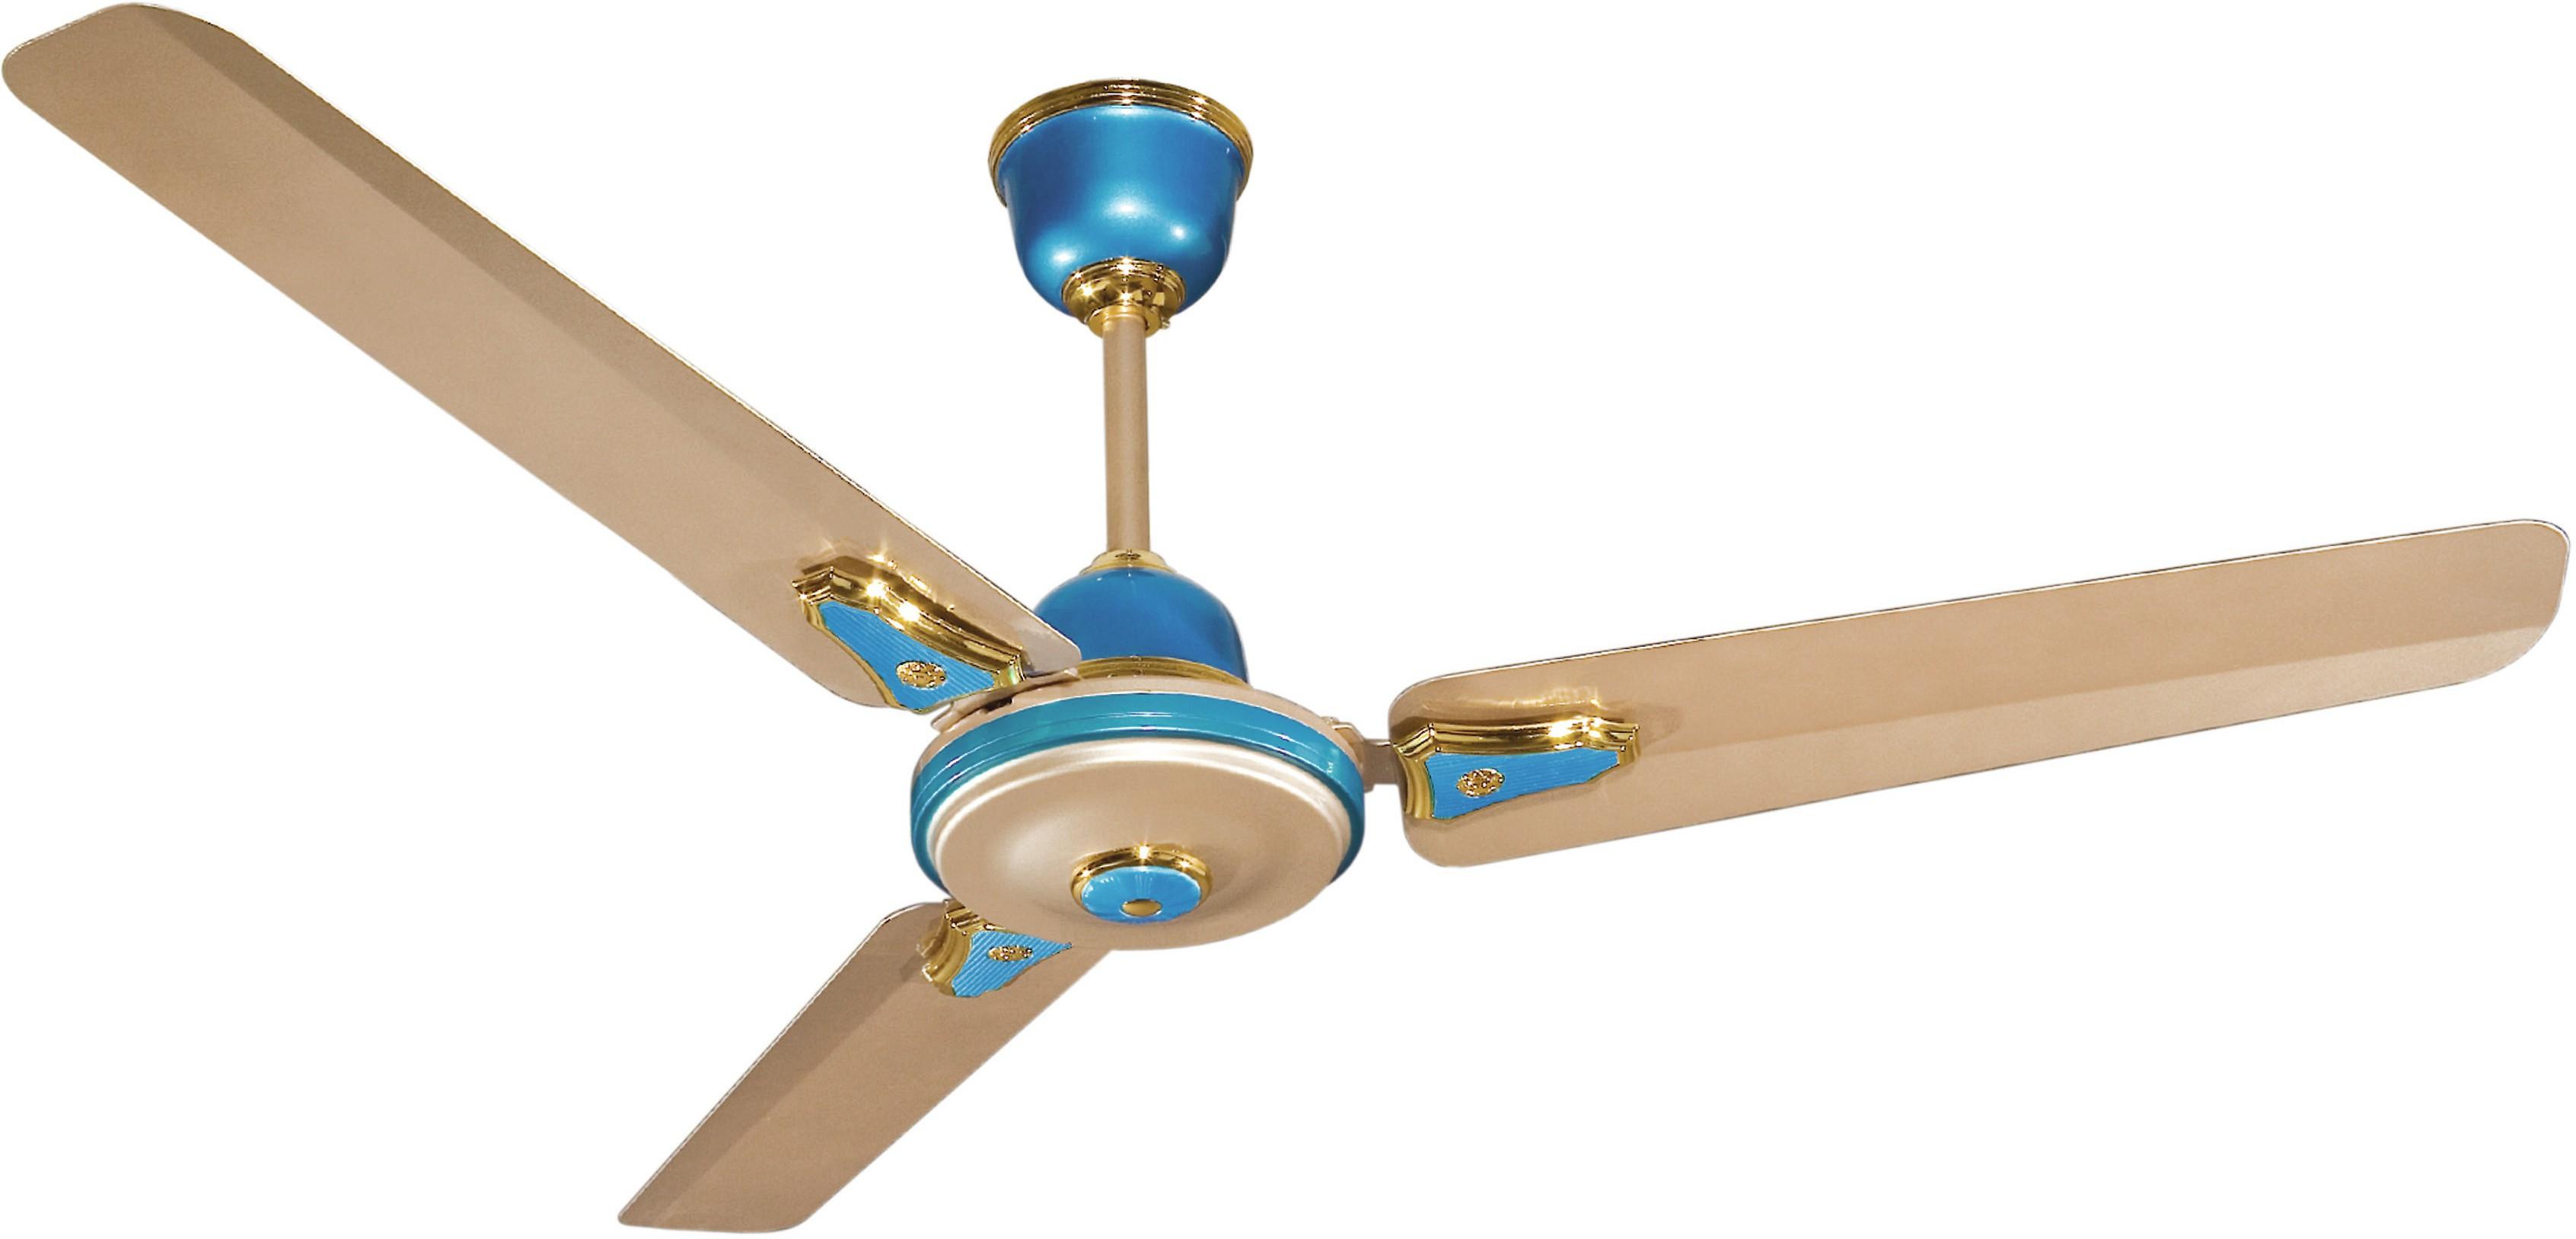 Crompton Greaves Hs Decora Metallic 1200mm Aqua 3 Blade Ceiling Fan Gold